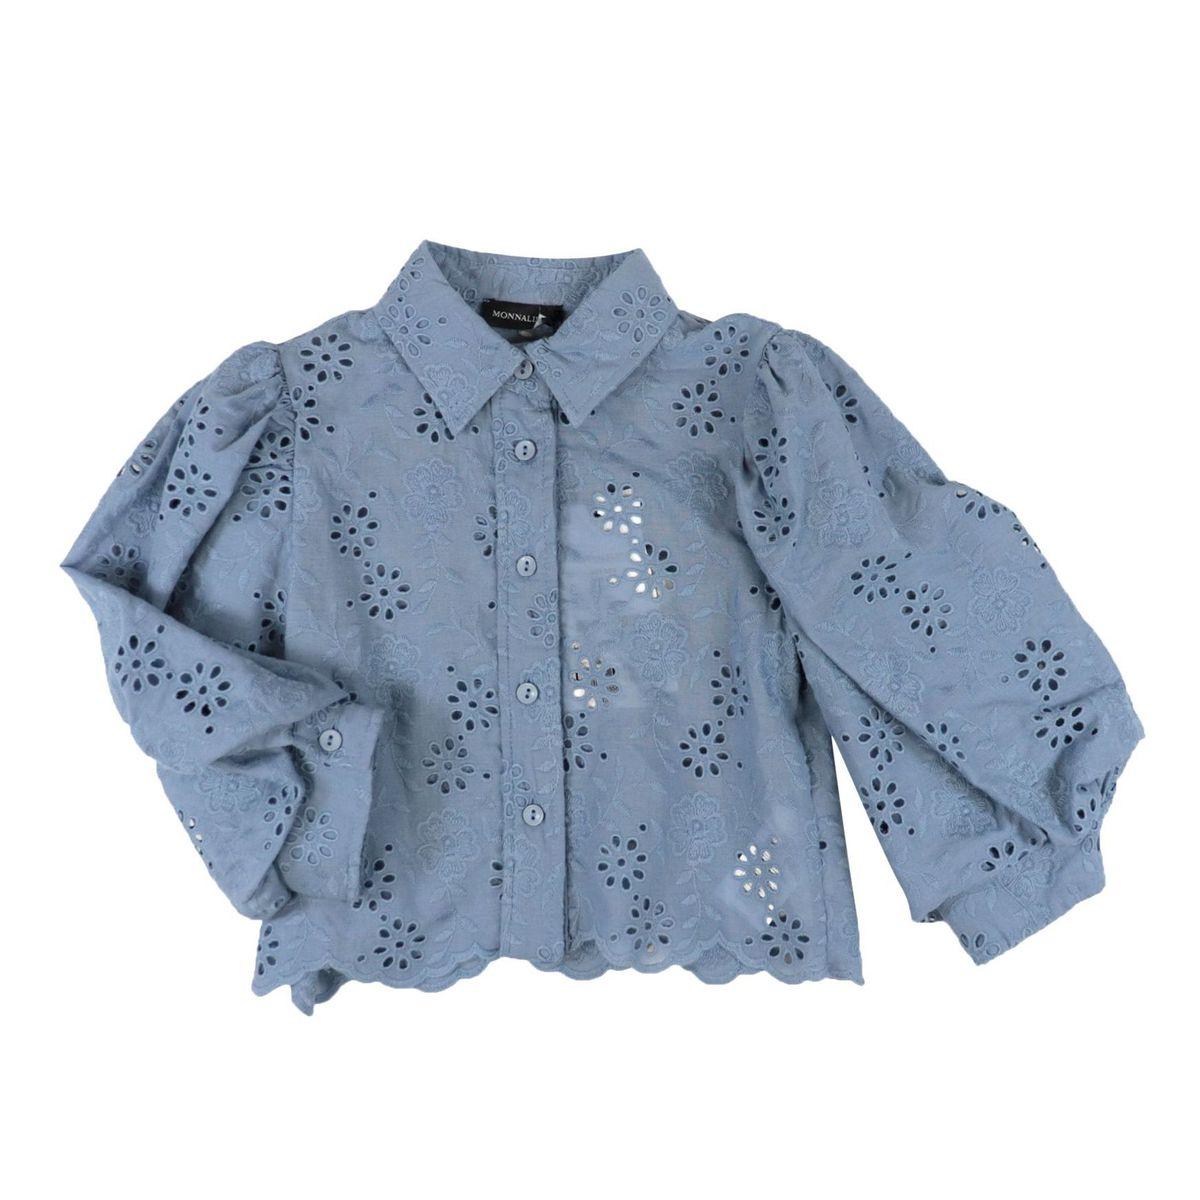 Cotton shirt with sangallo embroidery Avio Monnalisa